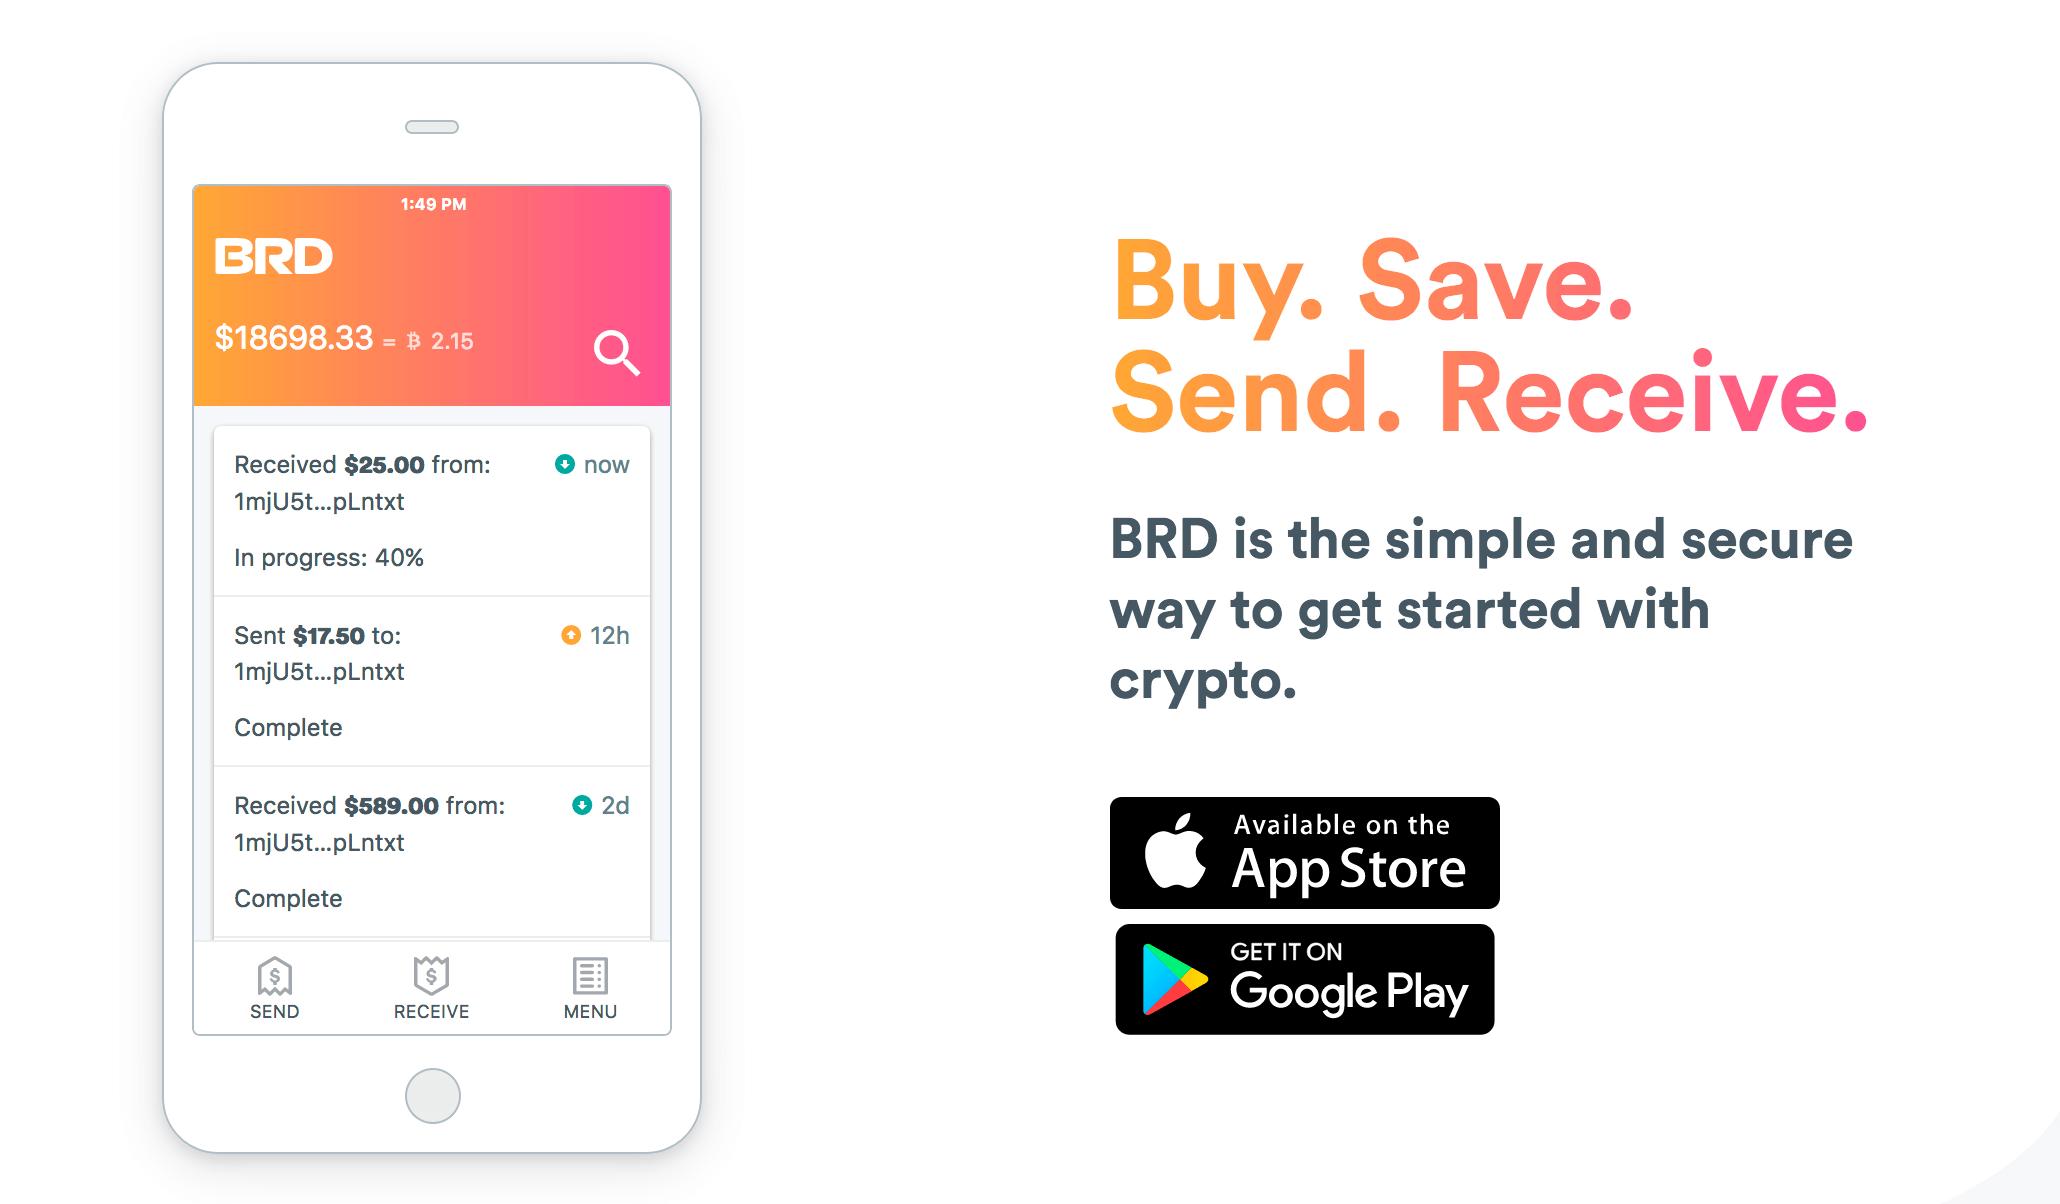 iPhoneアプリの仮想通貨ウォレット bread wallet(BRD)の使い方